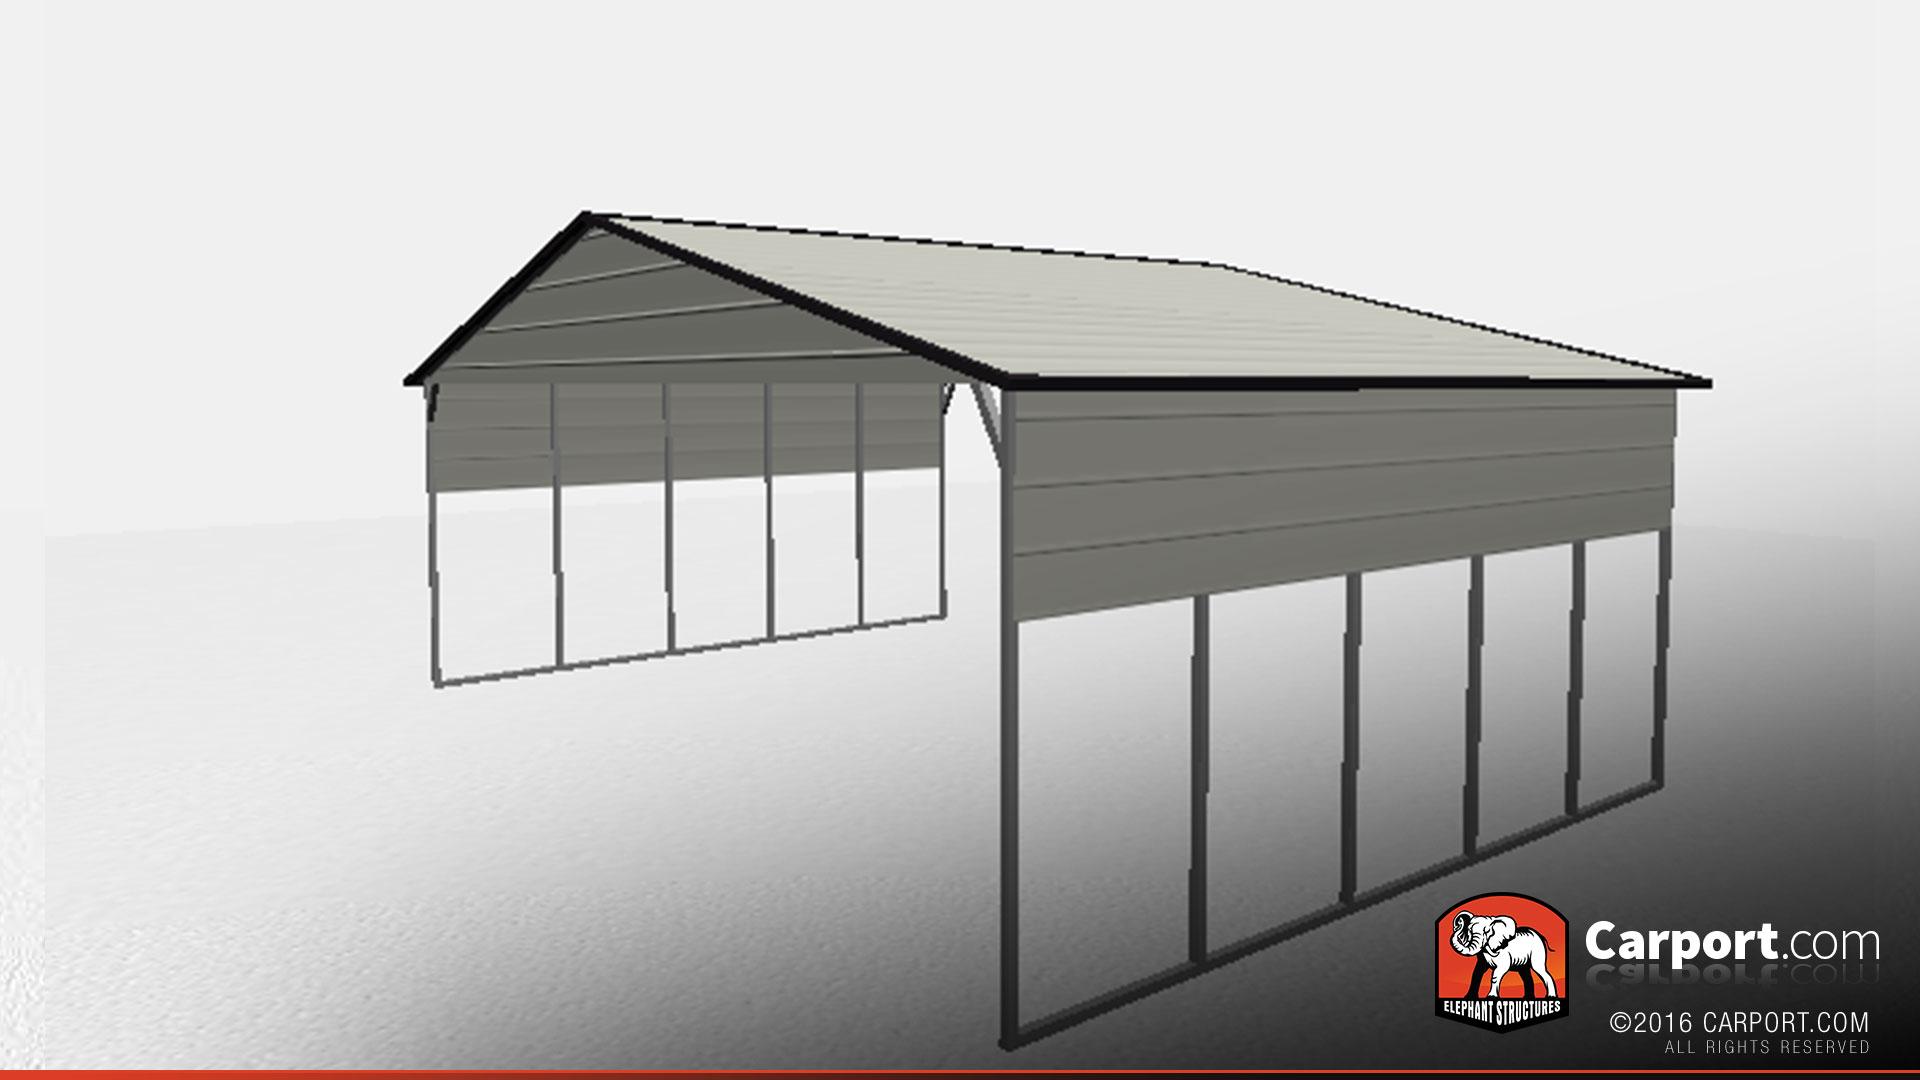 30 X 50 Triple Wide Car Port Shelter With Gables Metal Buildings Online